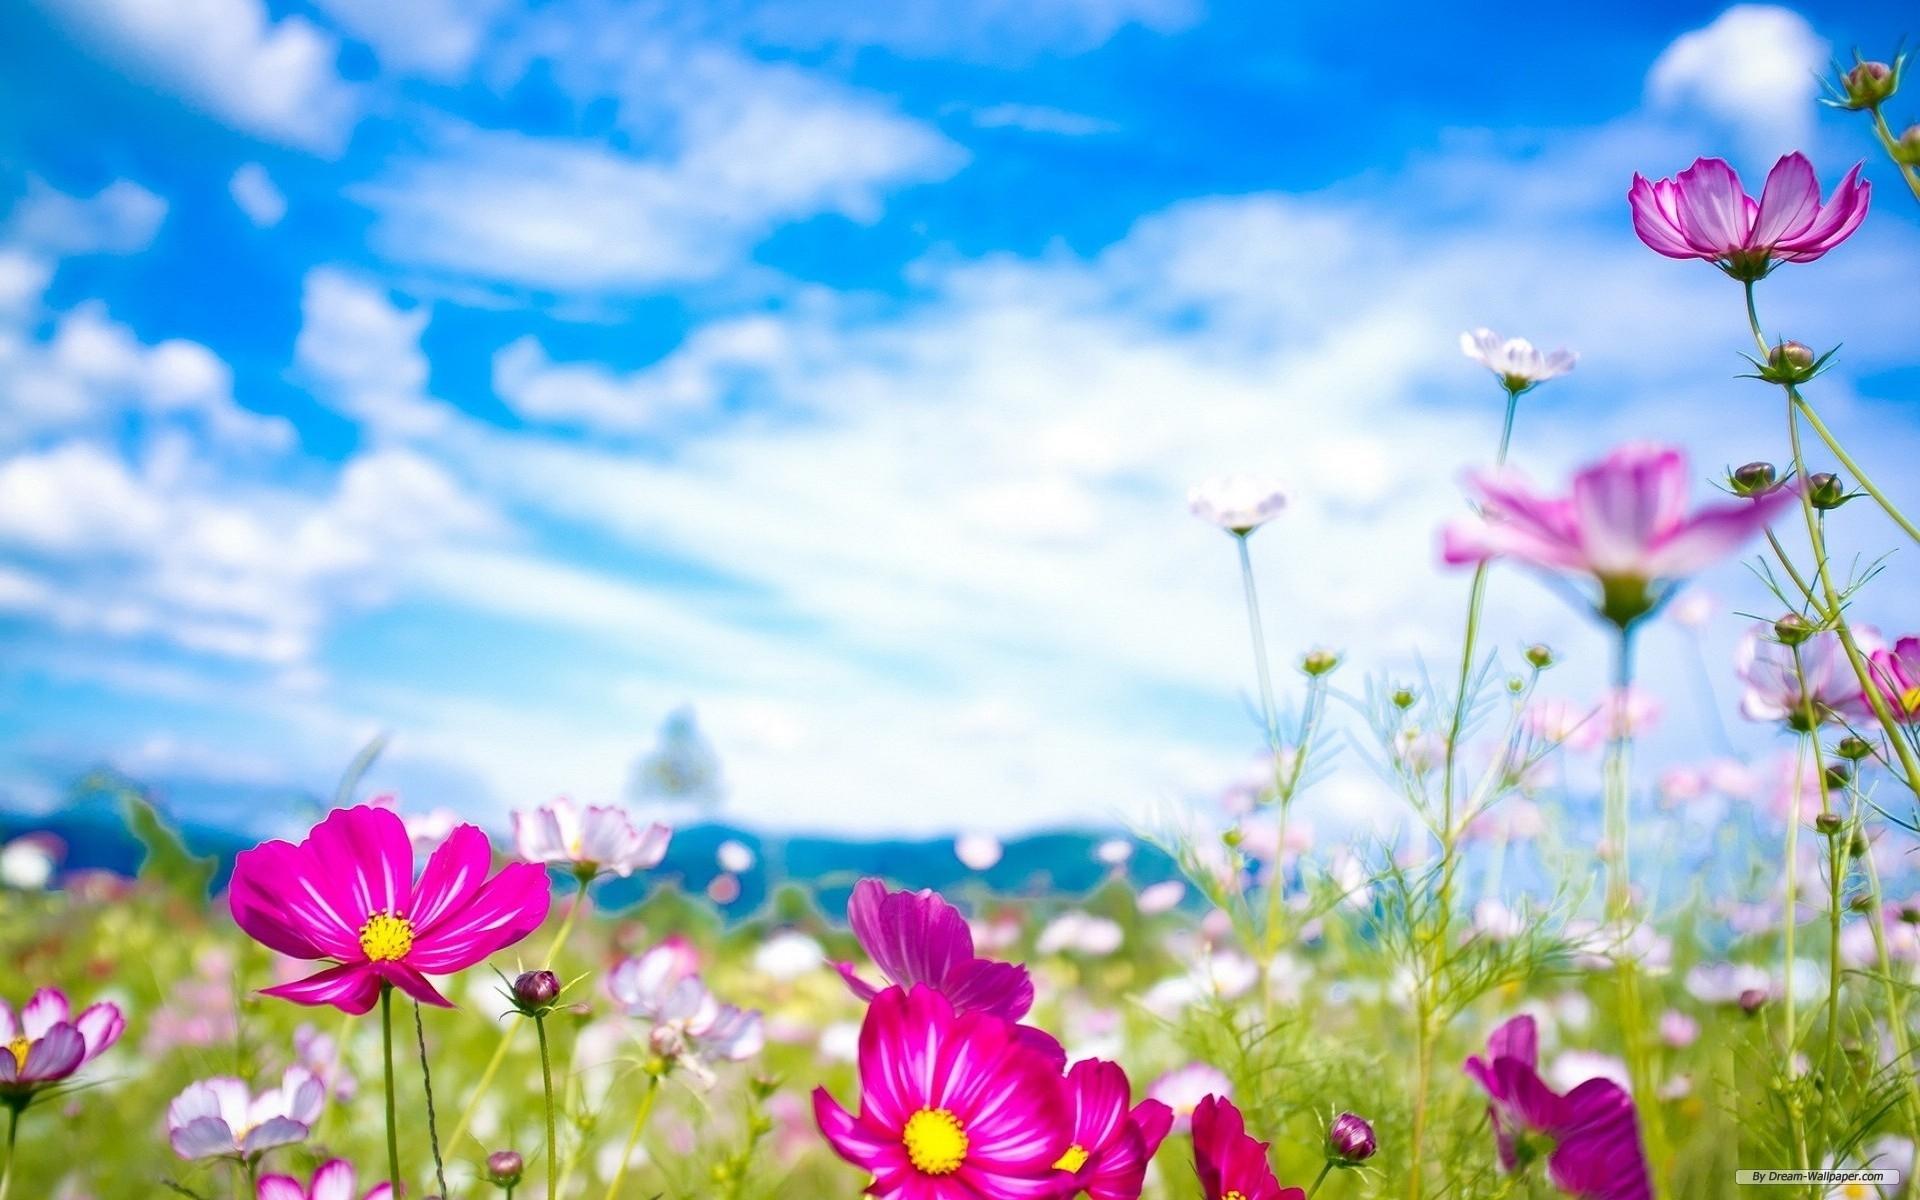 free wallpaper - free flower wallpaper - spring wildflowers